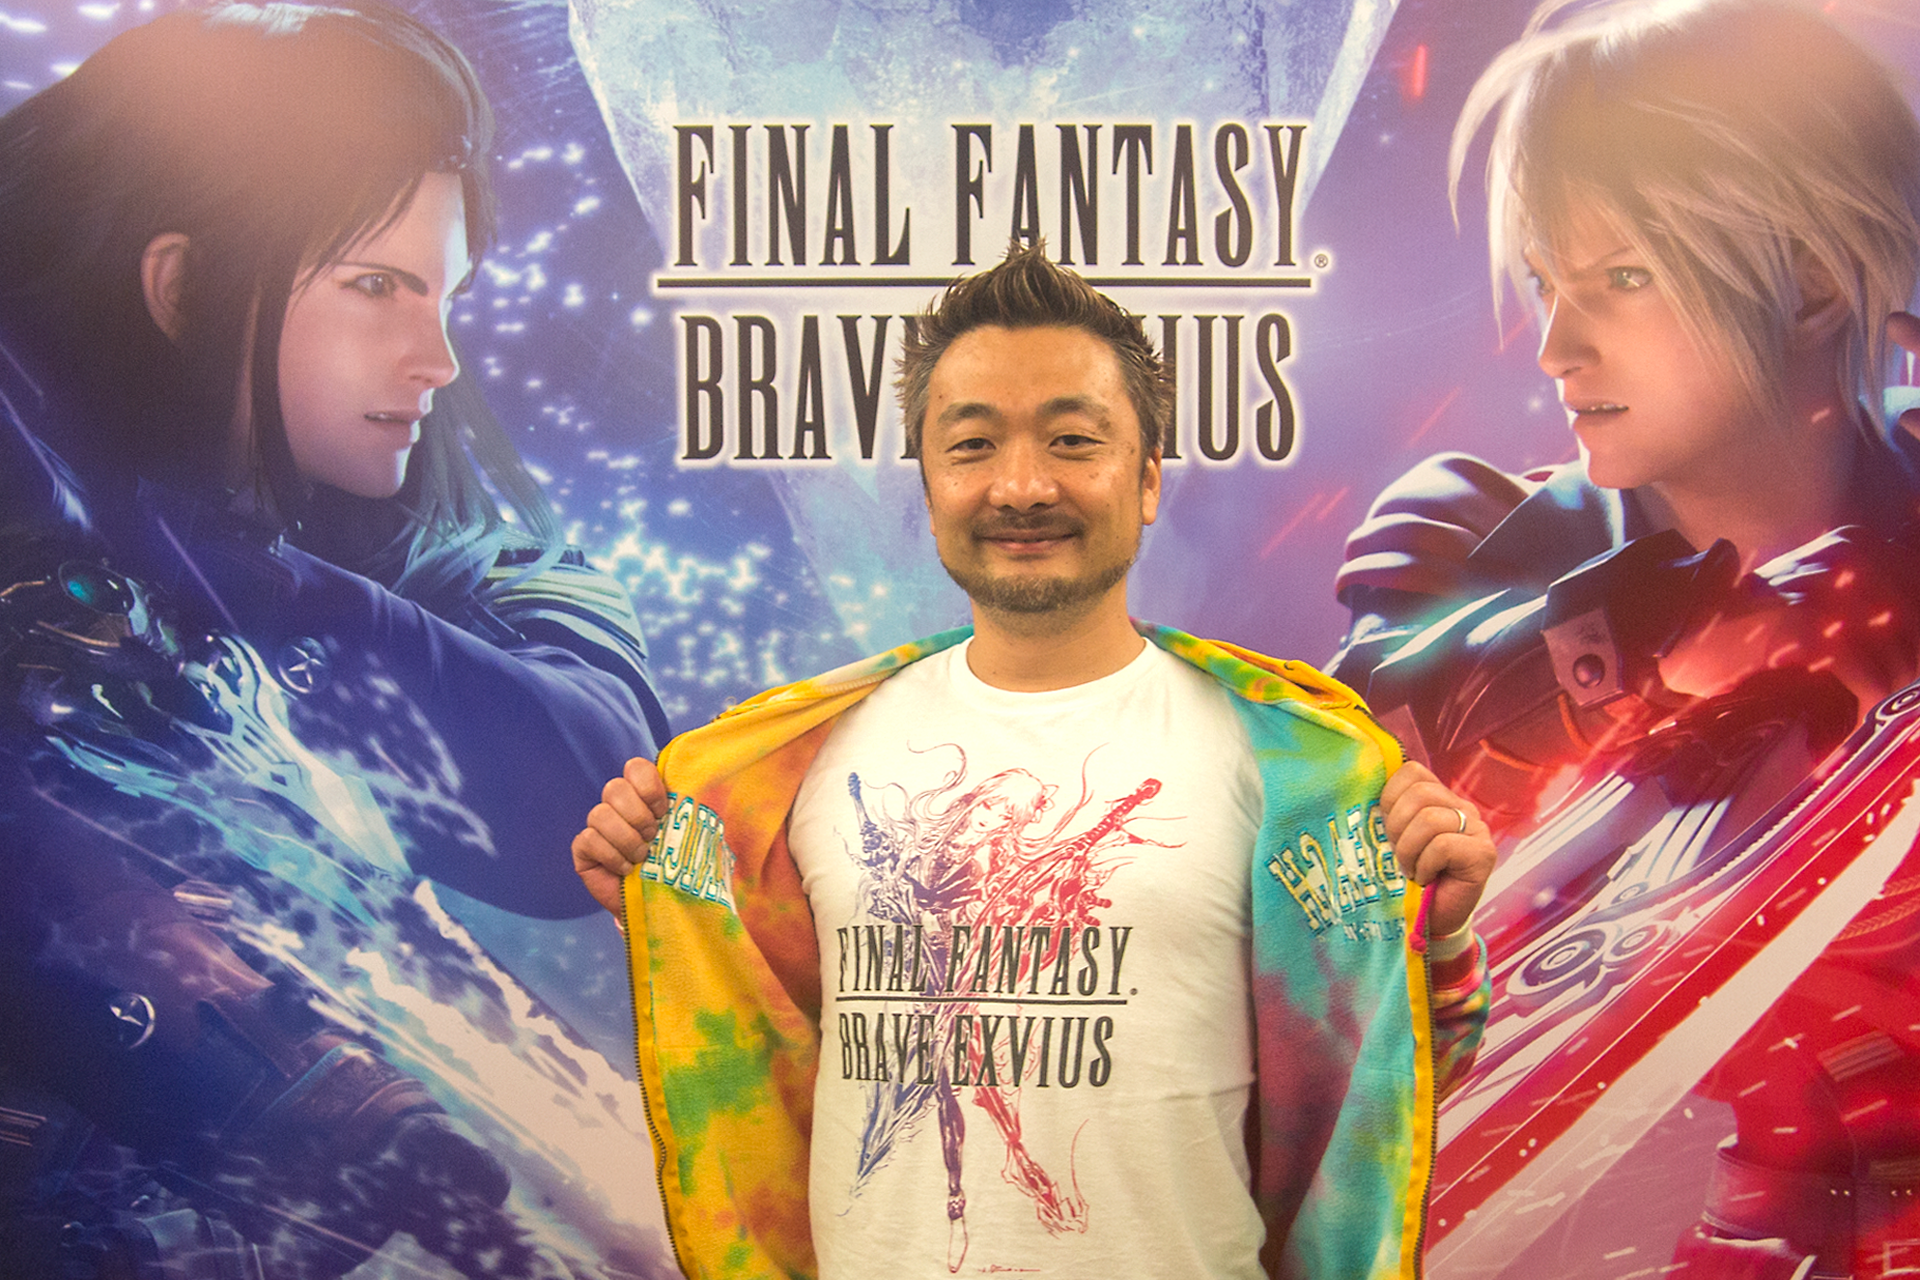 final fantasy brave exvius hiroki fujimoto